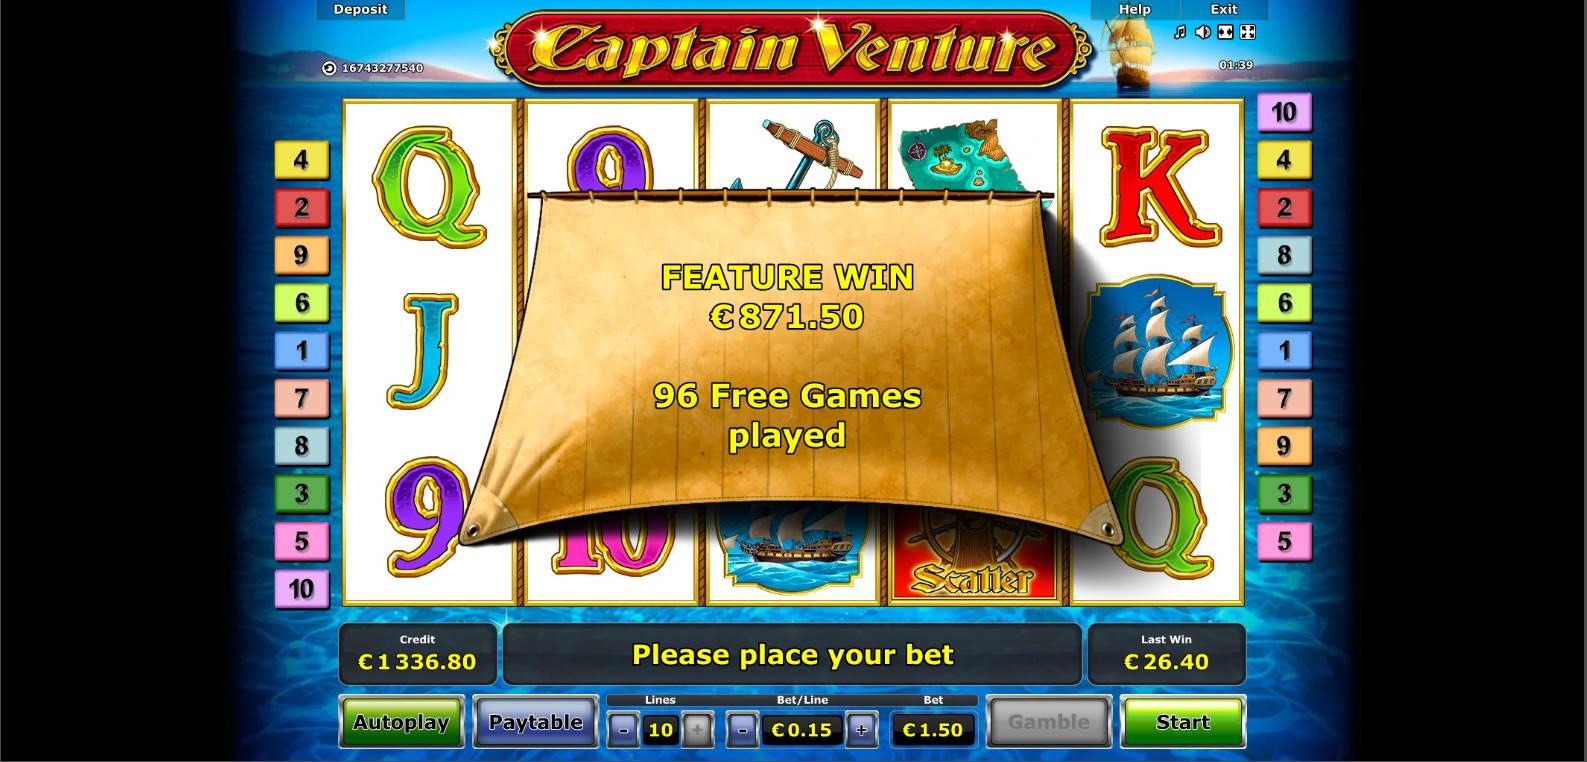 Captain Ventura Casino win picture by Morrimoykky 9.11.2020 871.50e 581X